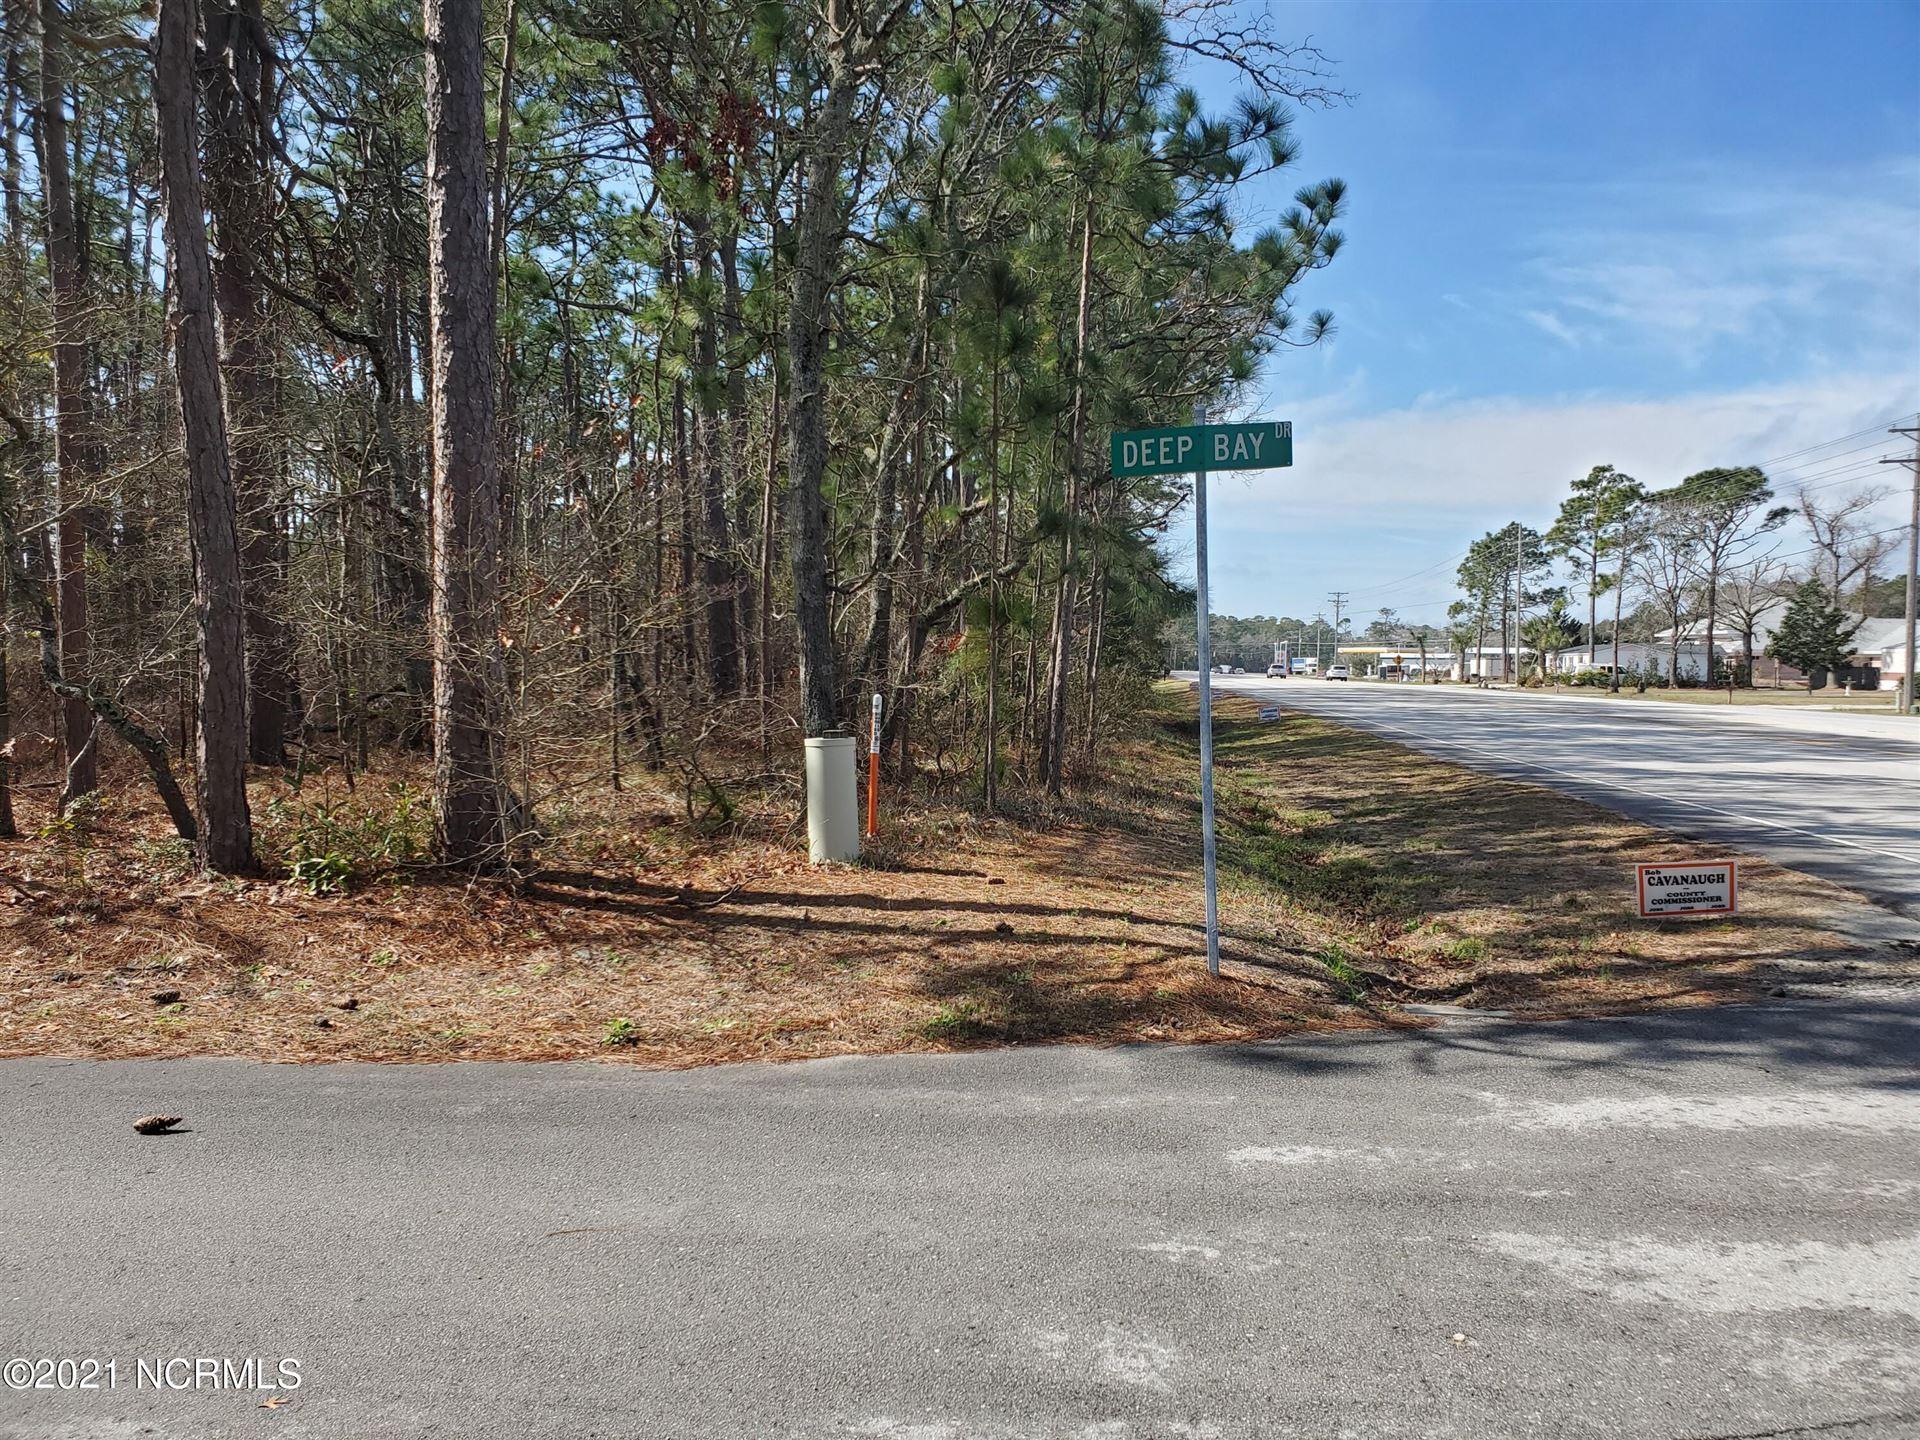 Photo of 118 Deep Bay Drive, Newport, NC 28570 (MLS # 100291461)